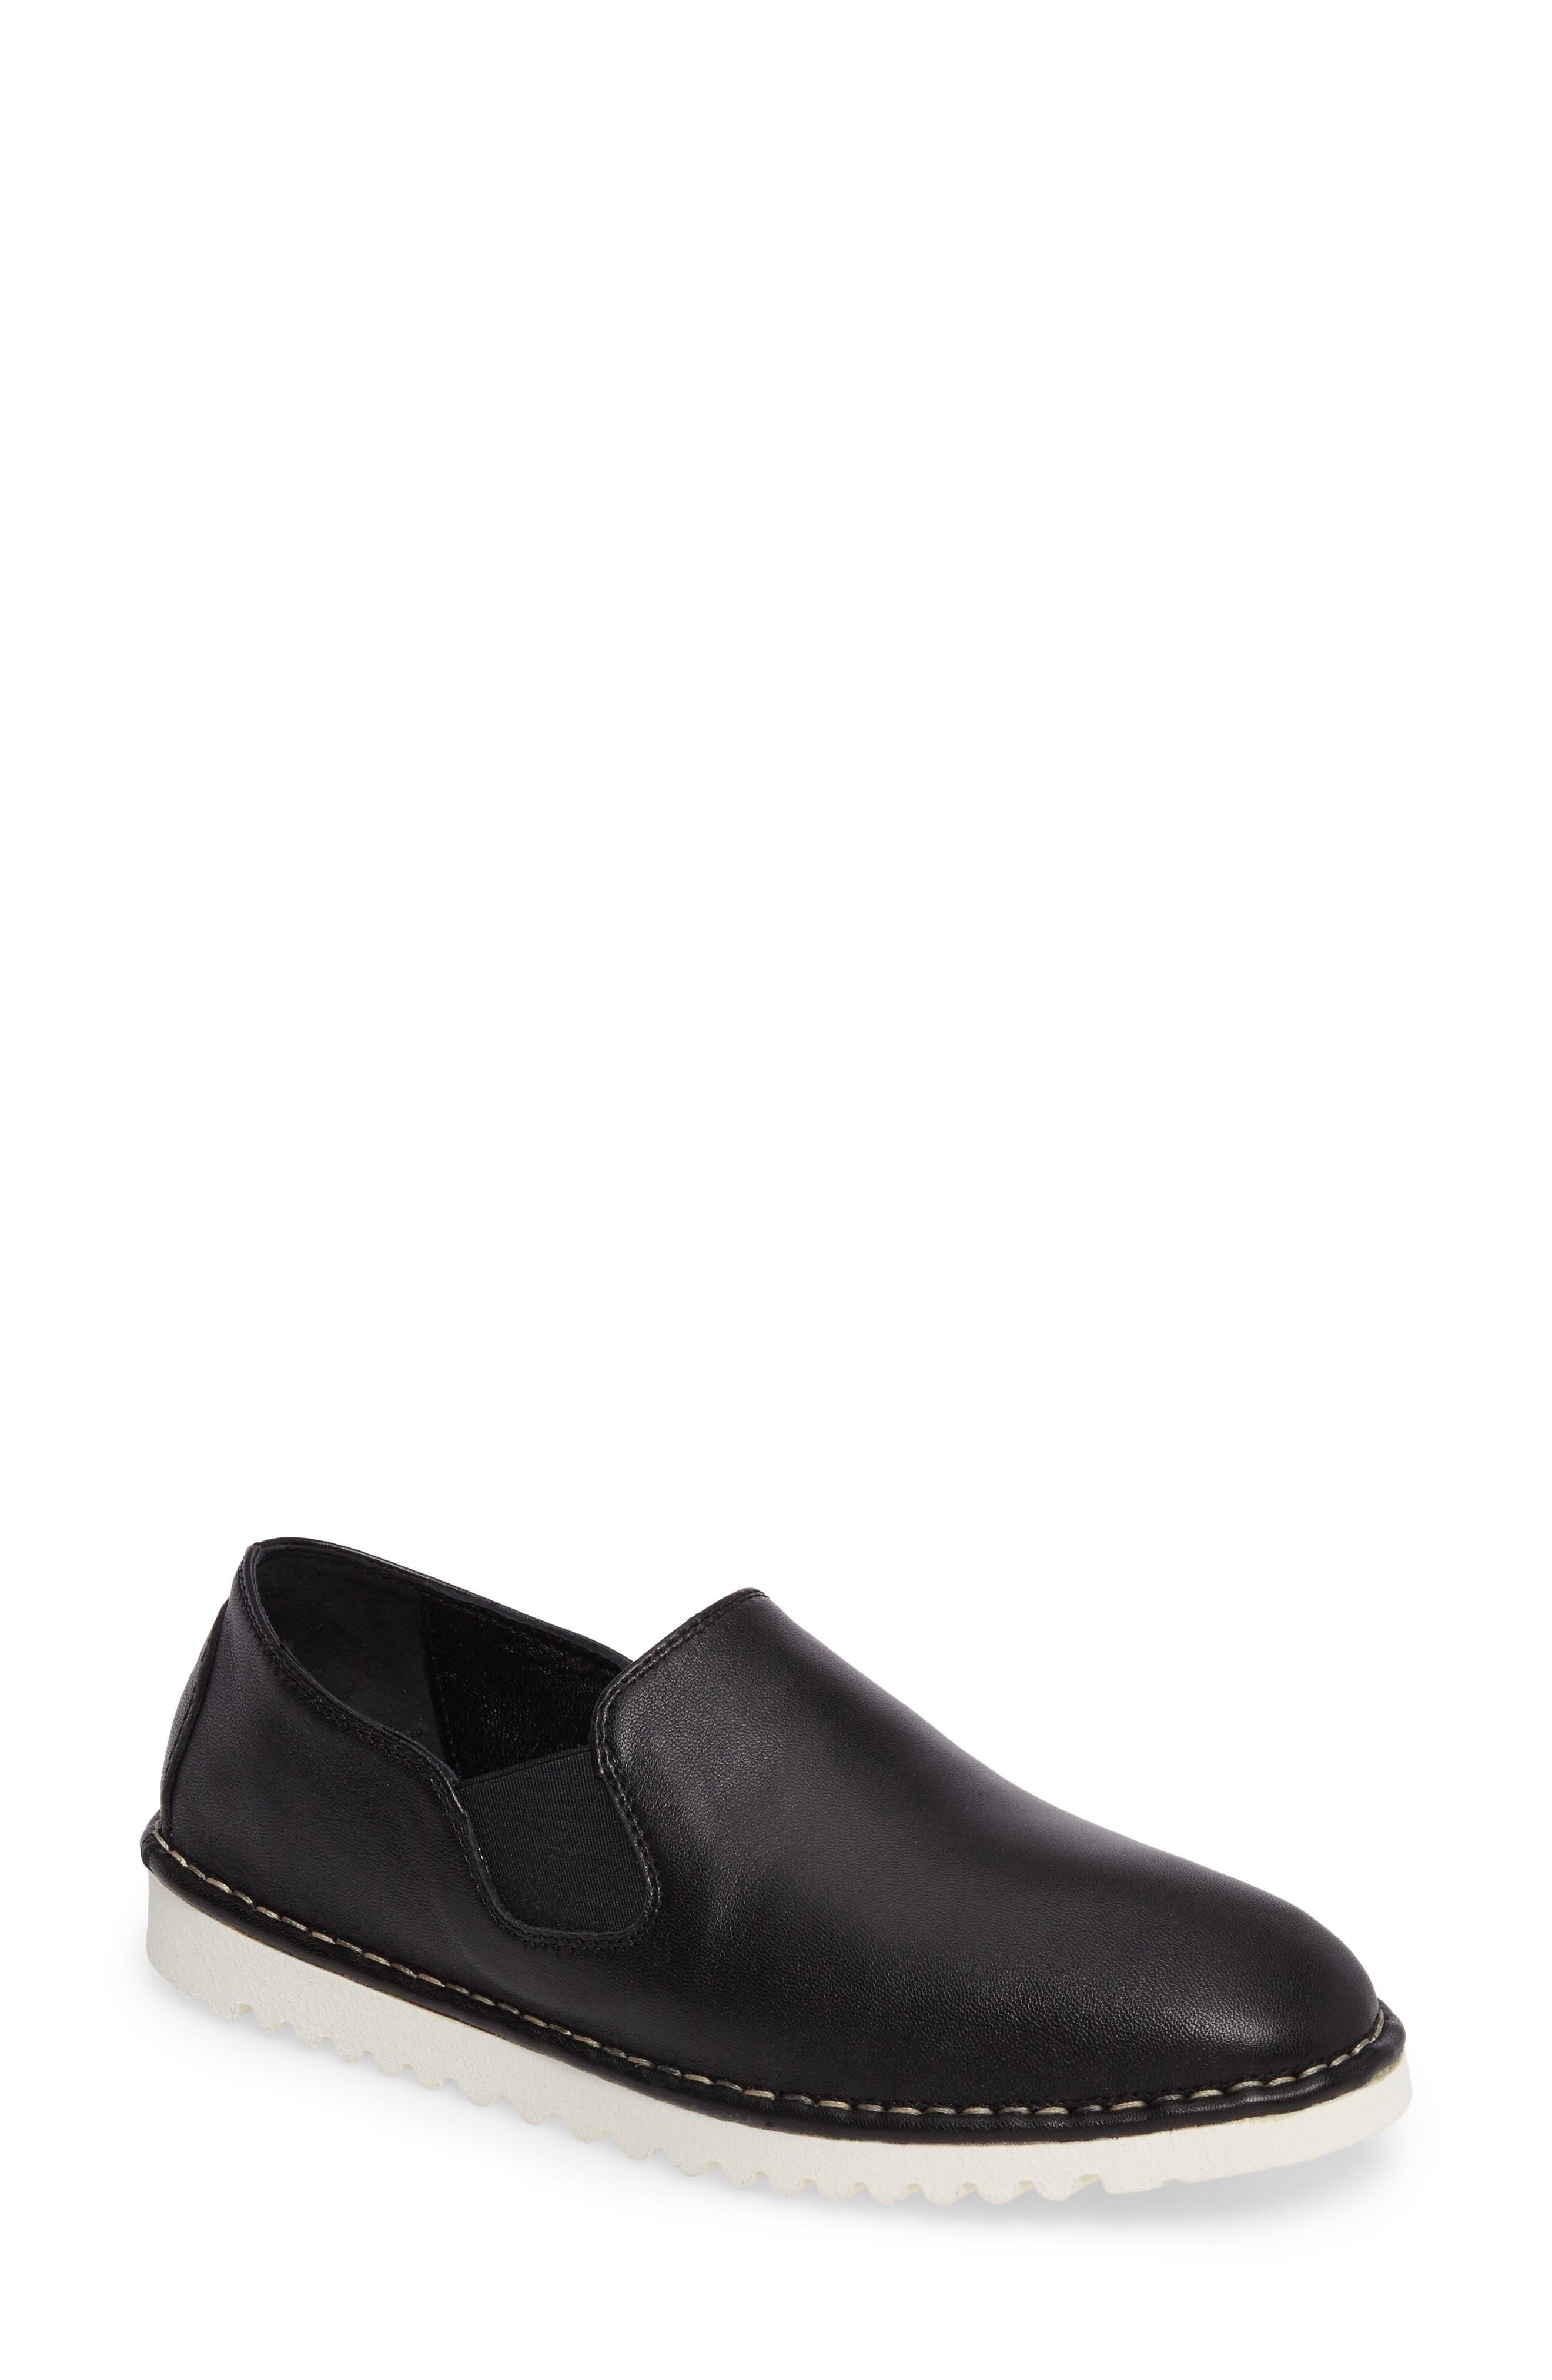 Alternate Image 1 Selected - Sesto Meucci Oralie Slip-On Sneaker (Women)